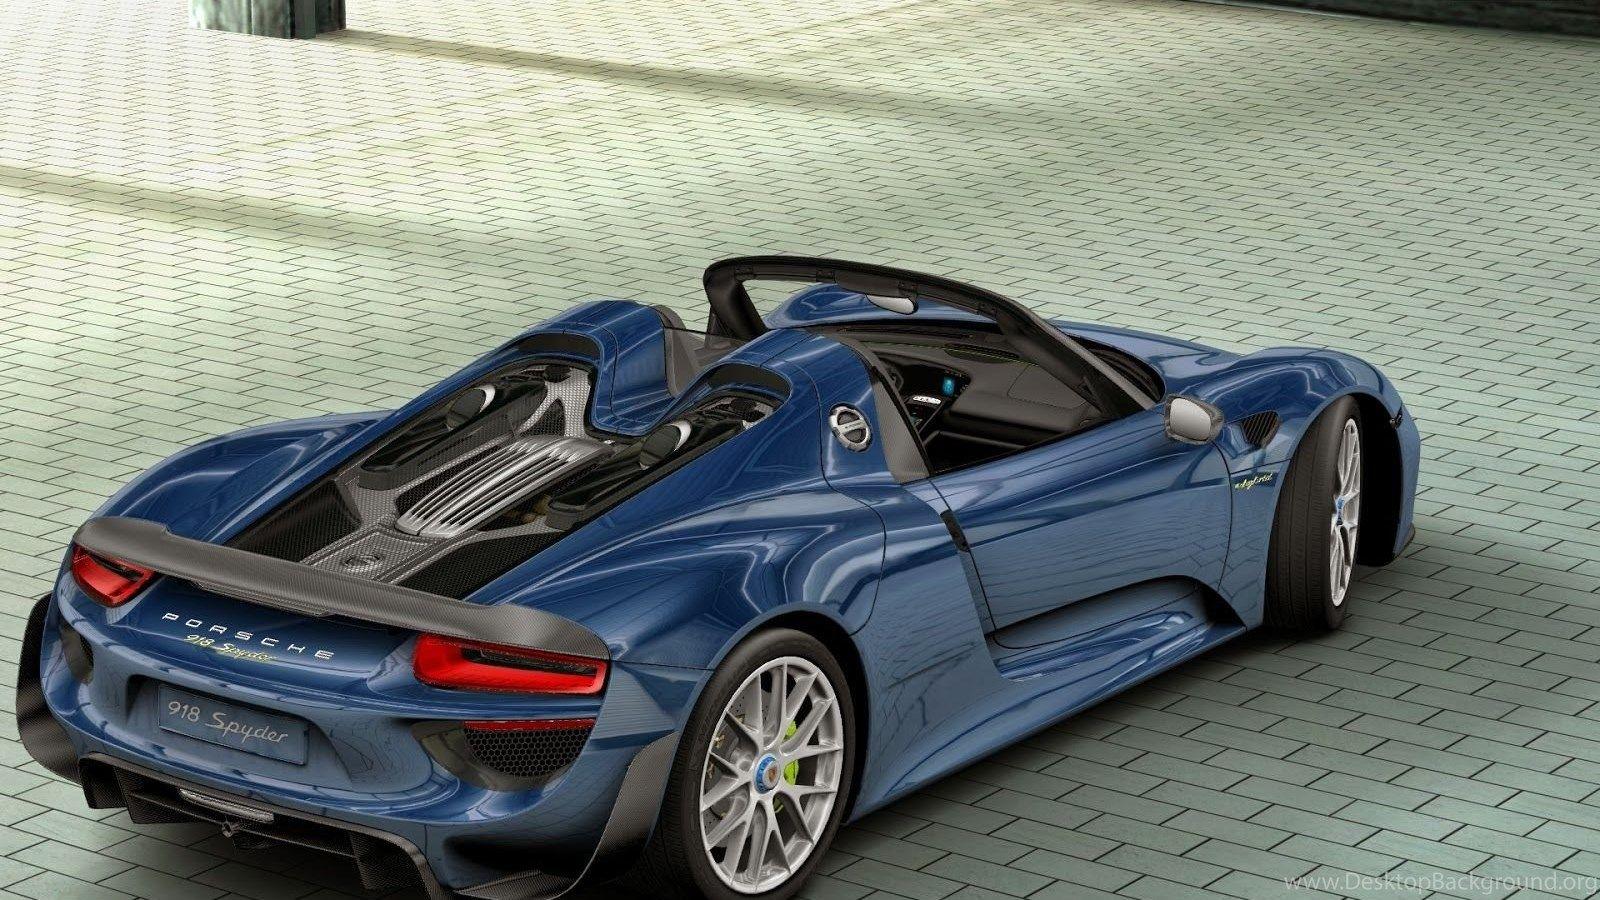 Porsche 918 Spyder Wallpapers Posted By Samantha Johnson